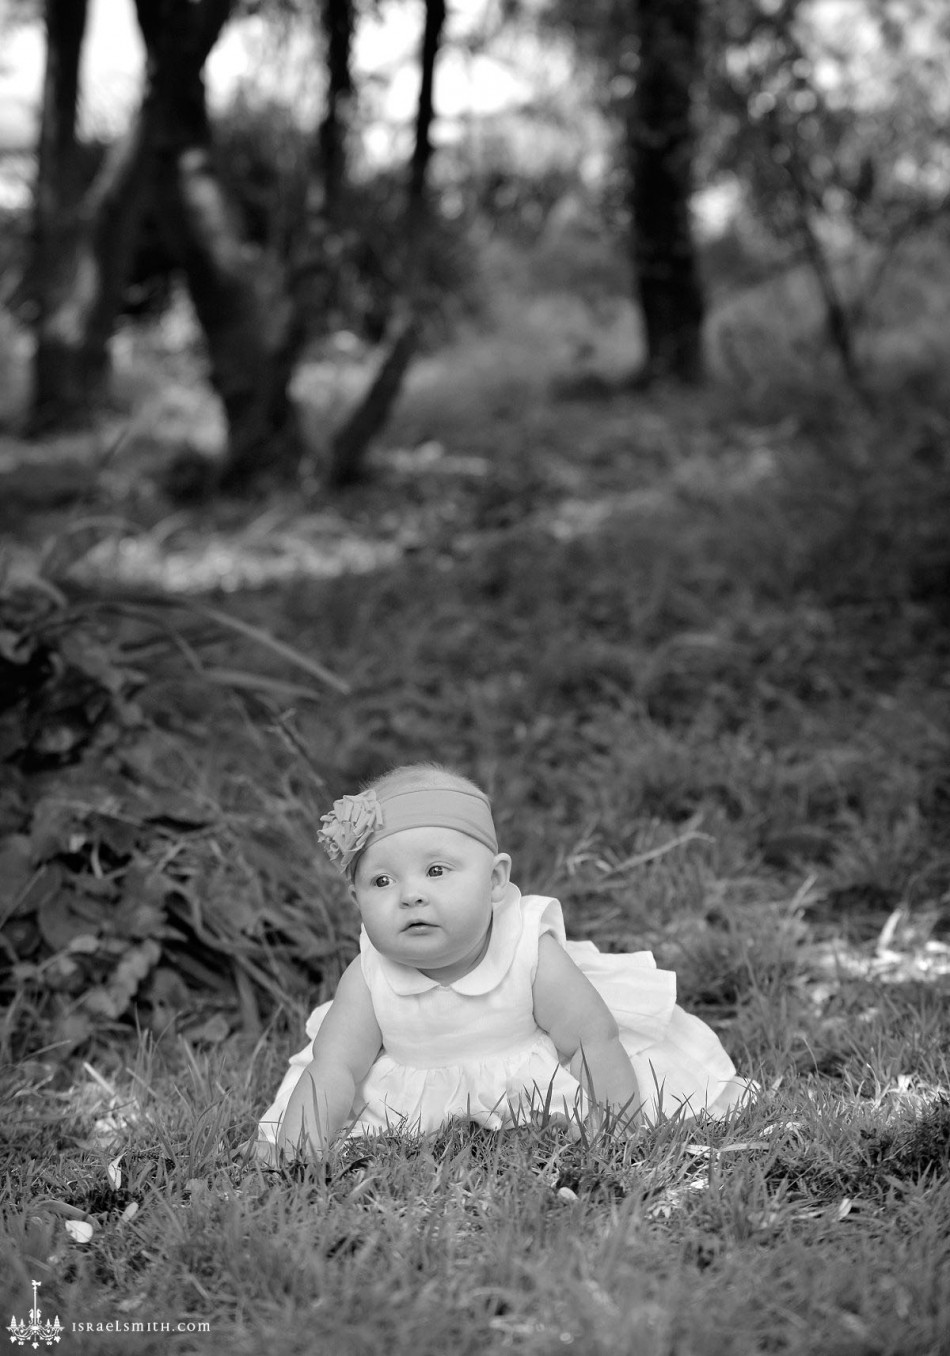 Israel-Smith-Family-Portraits-Angela_Chad_0028